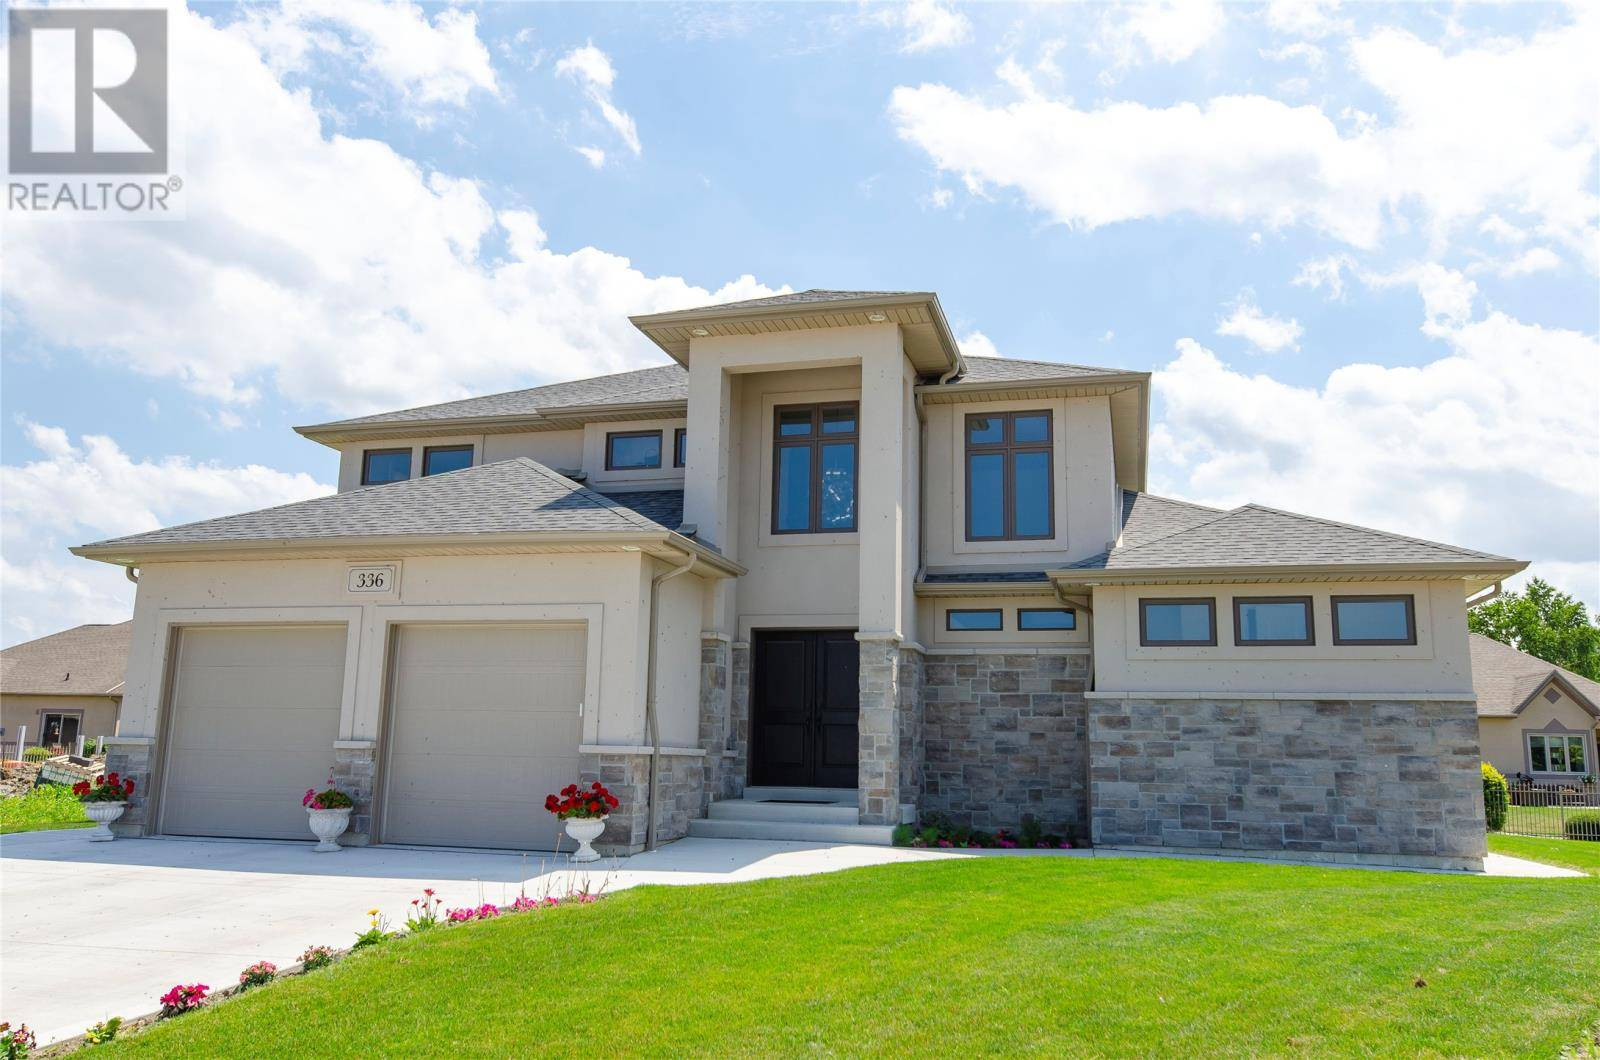 House for sale at 336 Lakewood  Tecumseh Ontario - MLS: 19025121